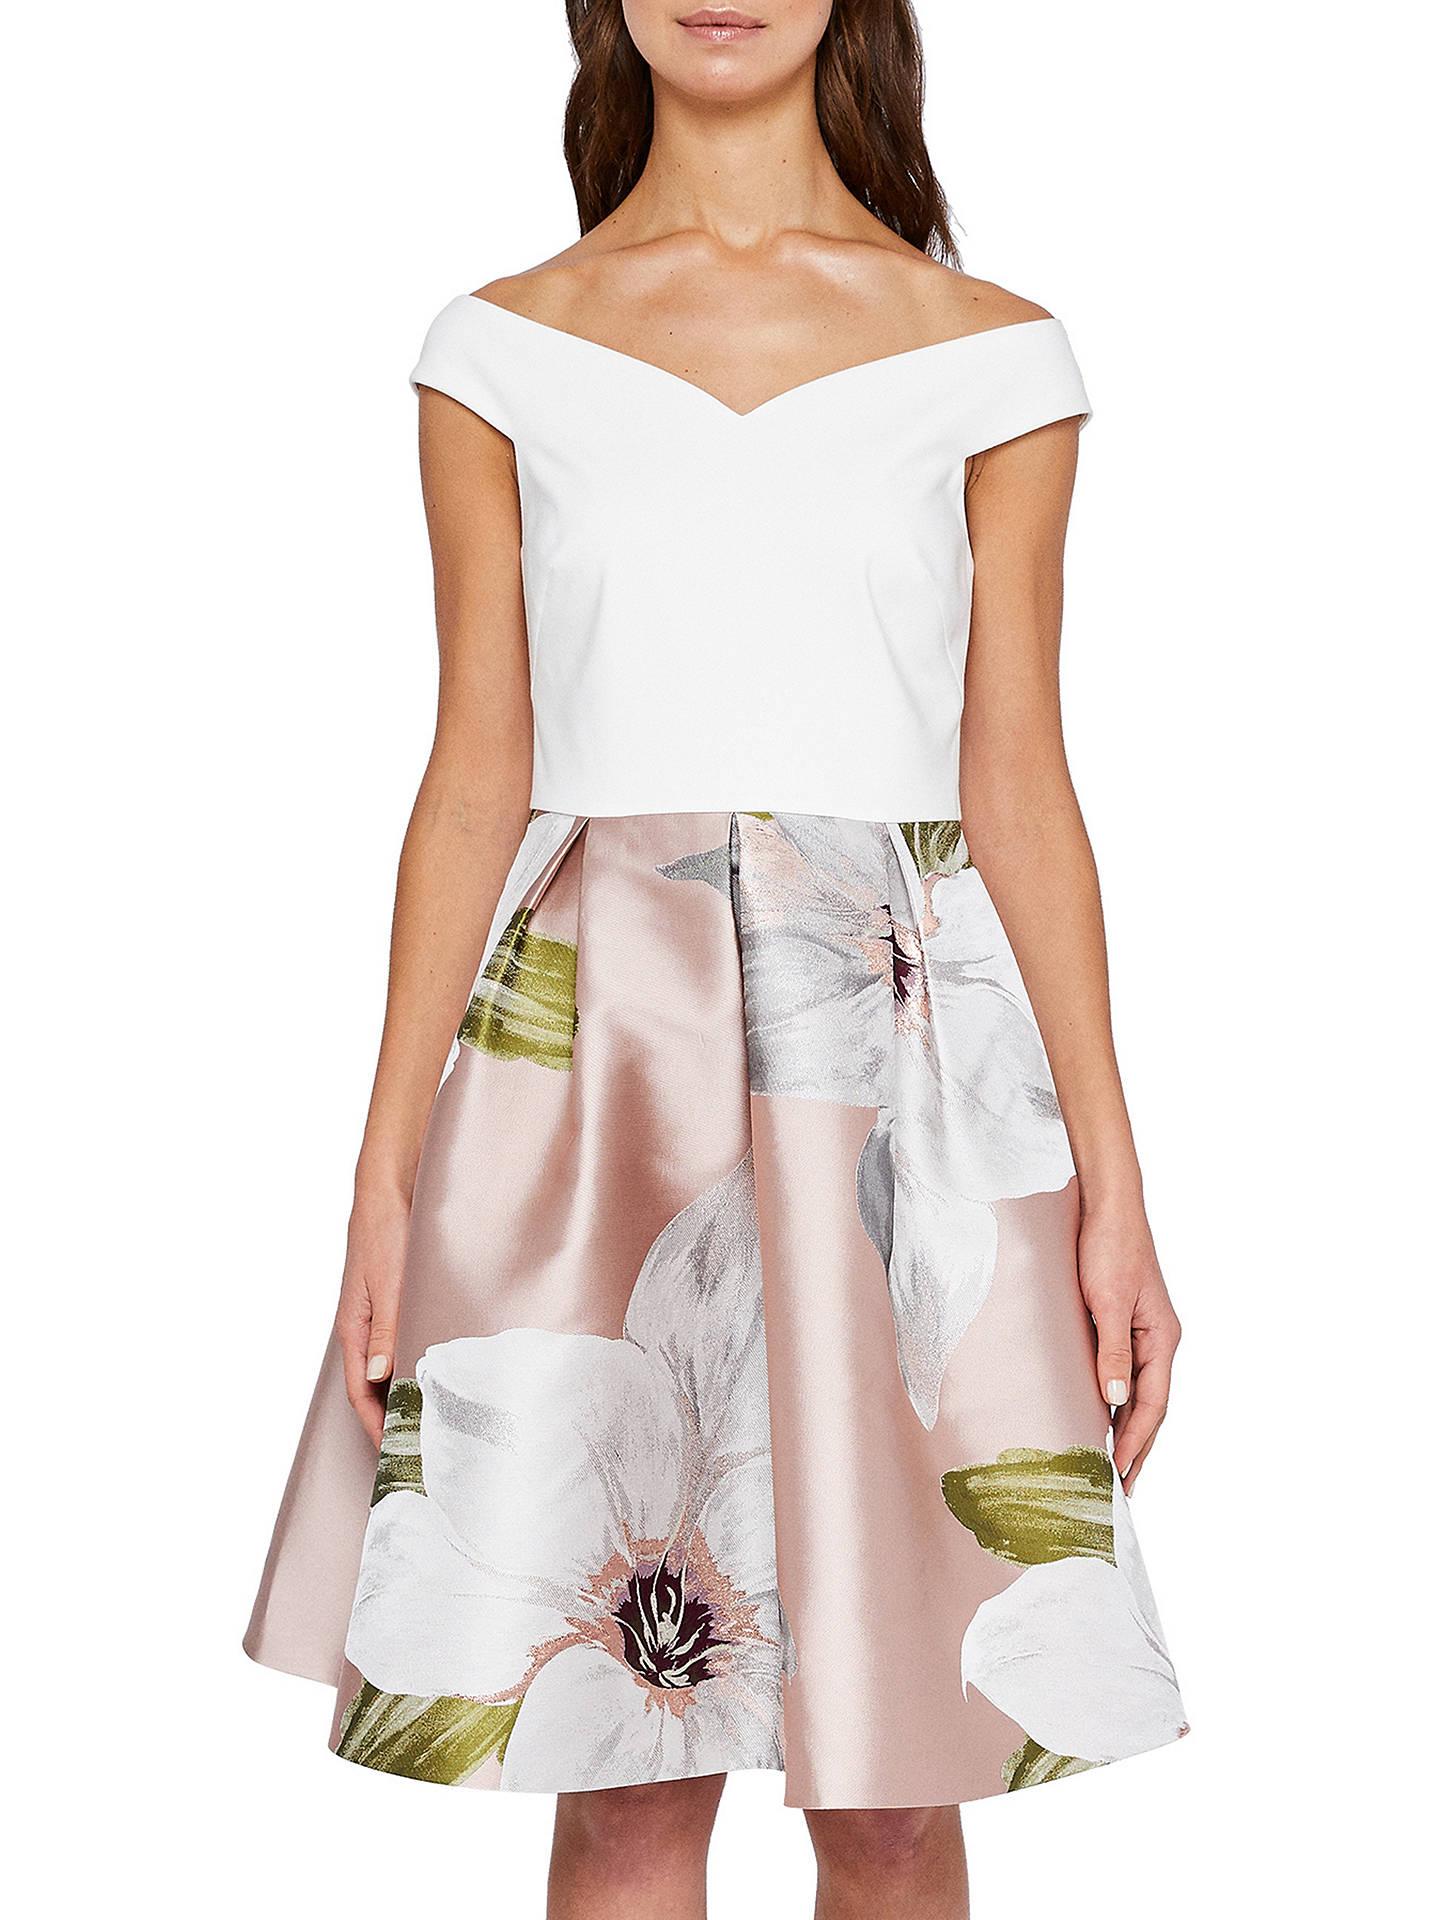 1bdcfe48f8c4 Buy Ted Baker Chatsworth Jacquard Dress